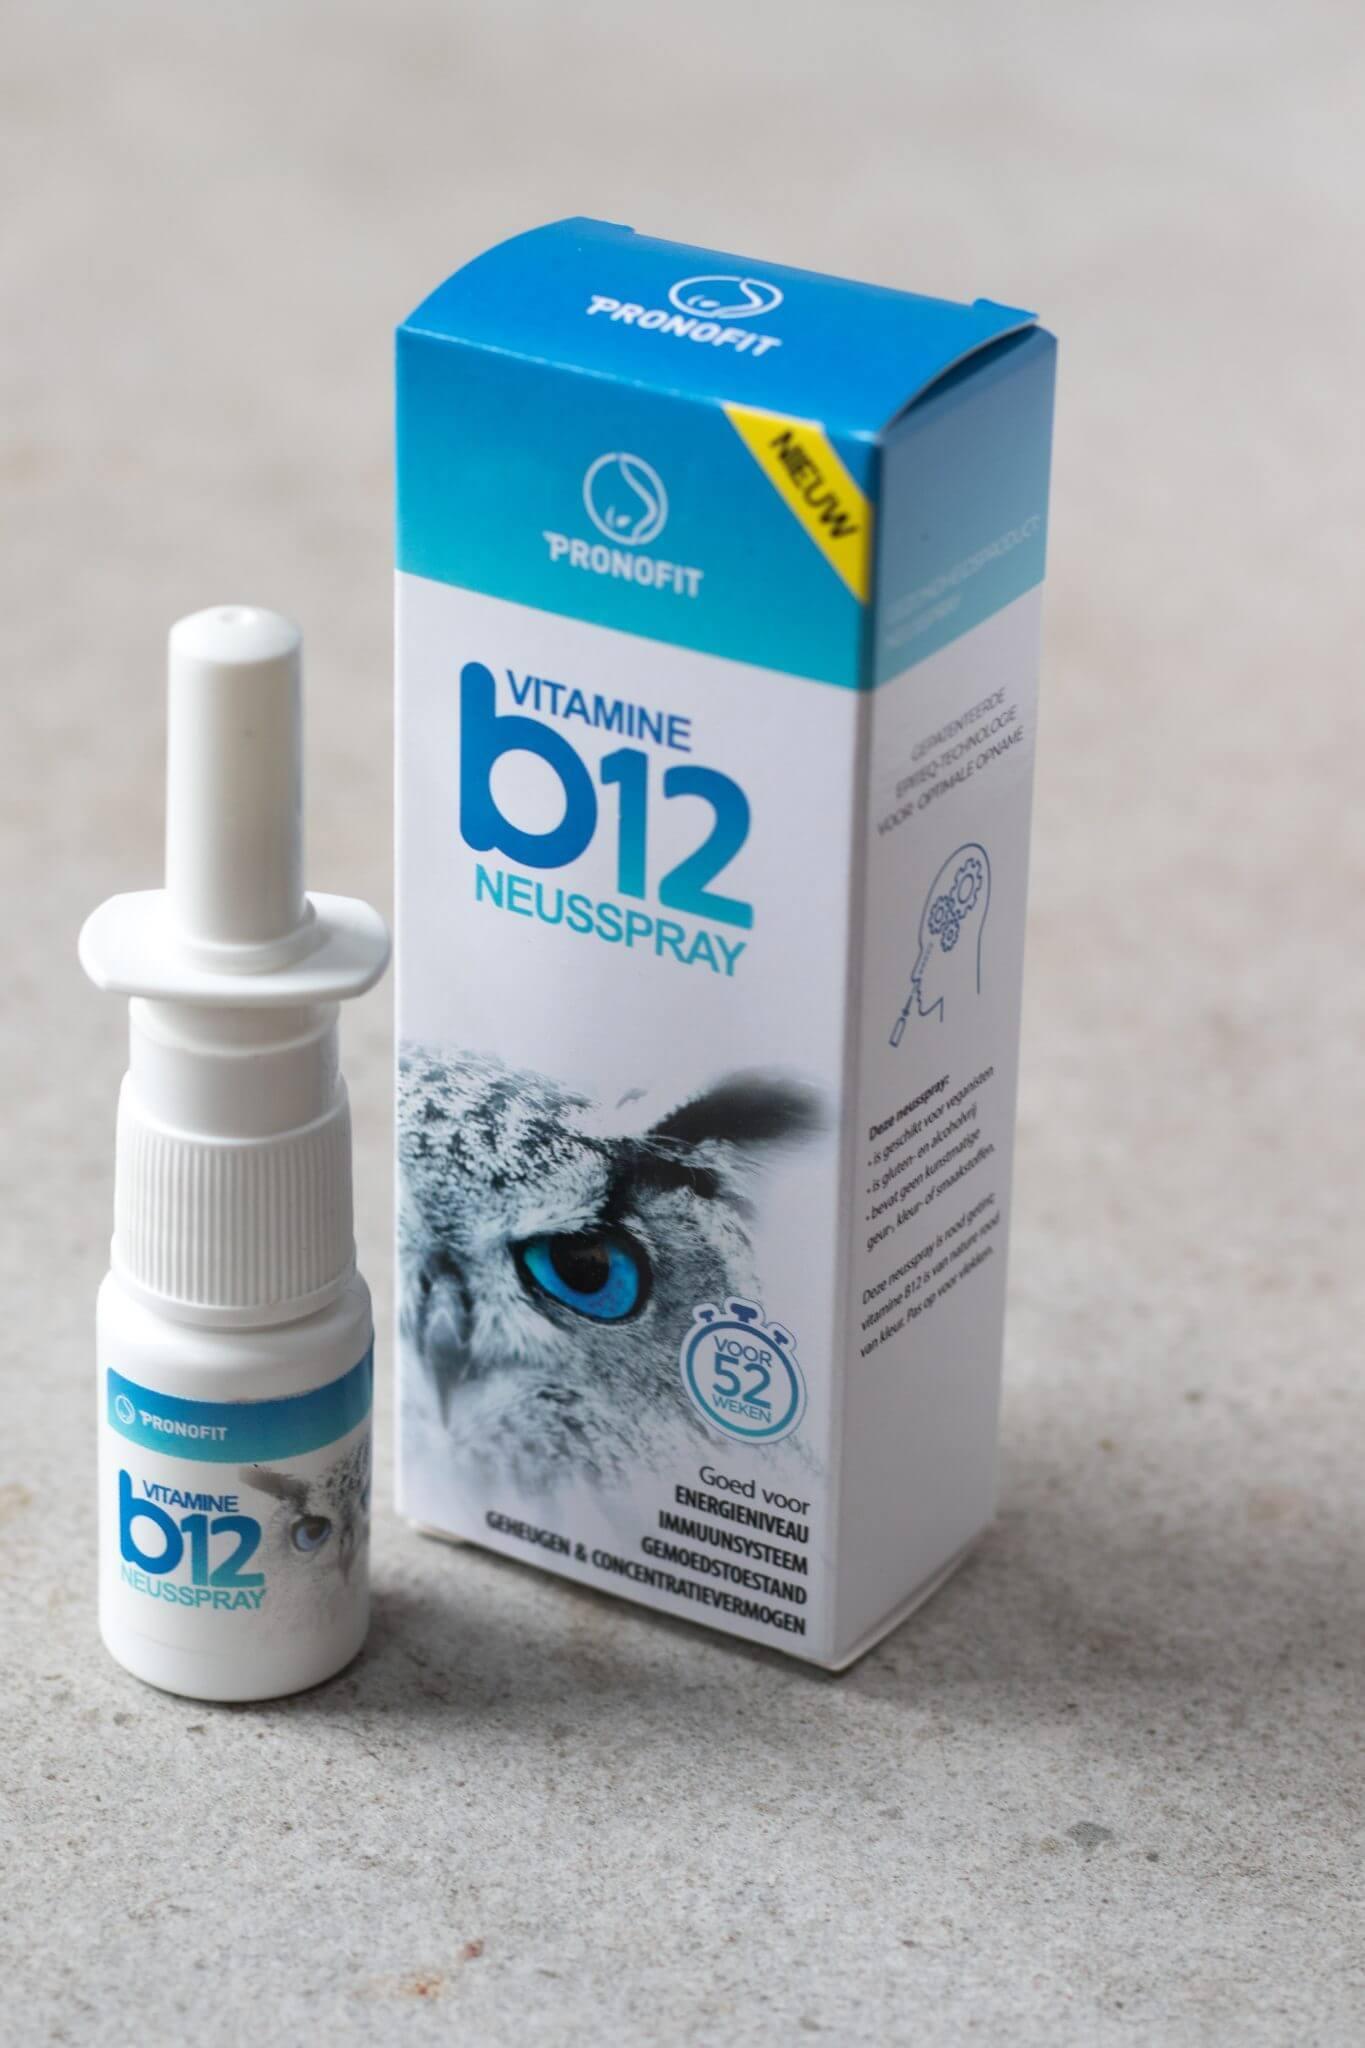 vitamine-b12-neusspray